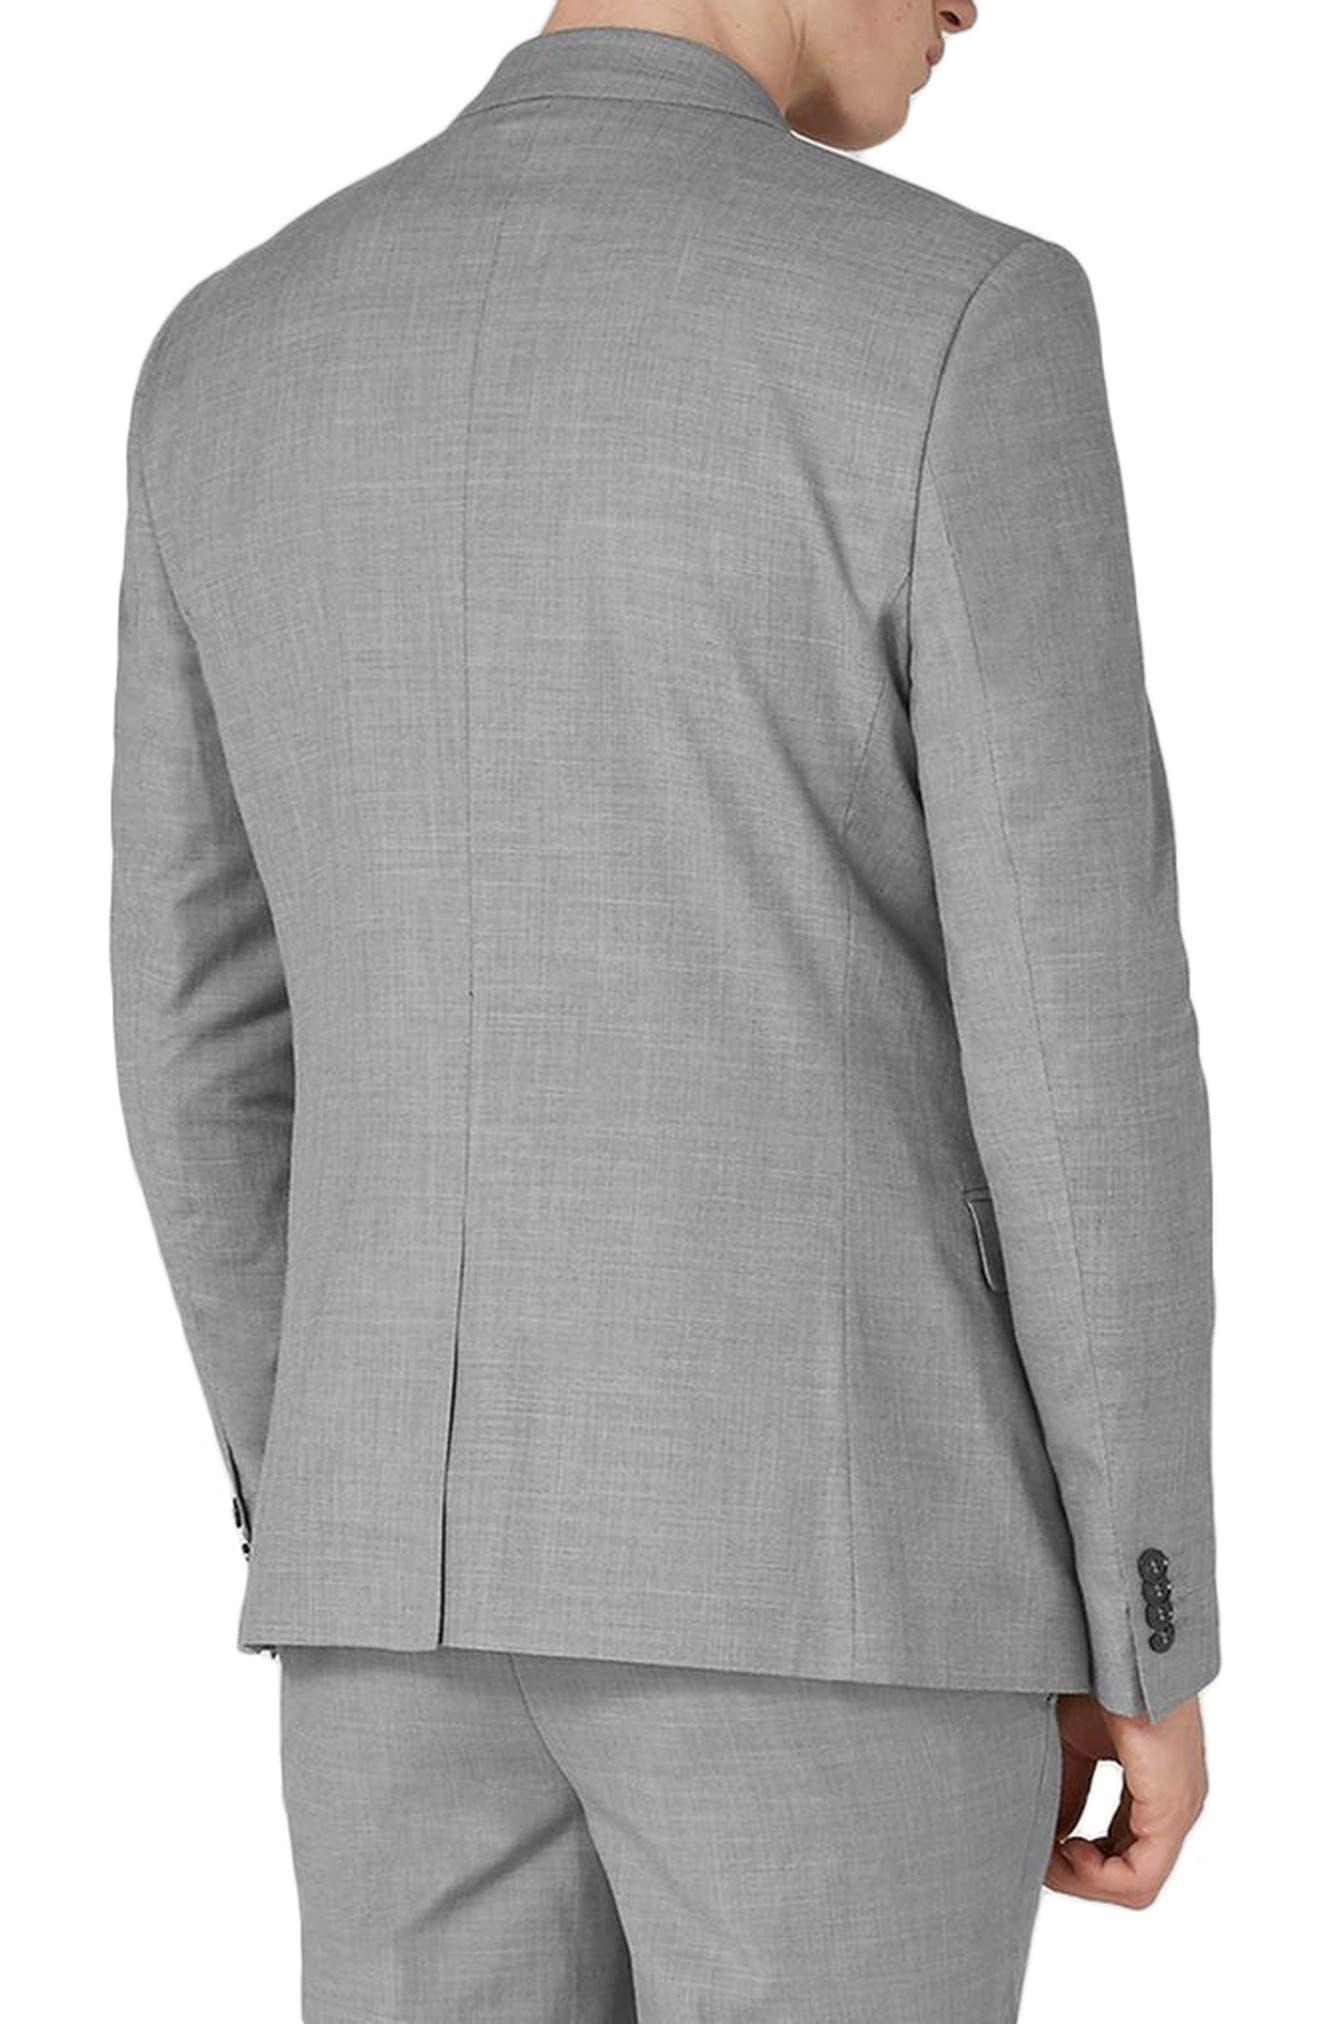 Skinny Fit Suit Jacket,                             Alternate thumbnail 2, color,                             GREY